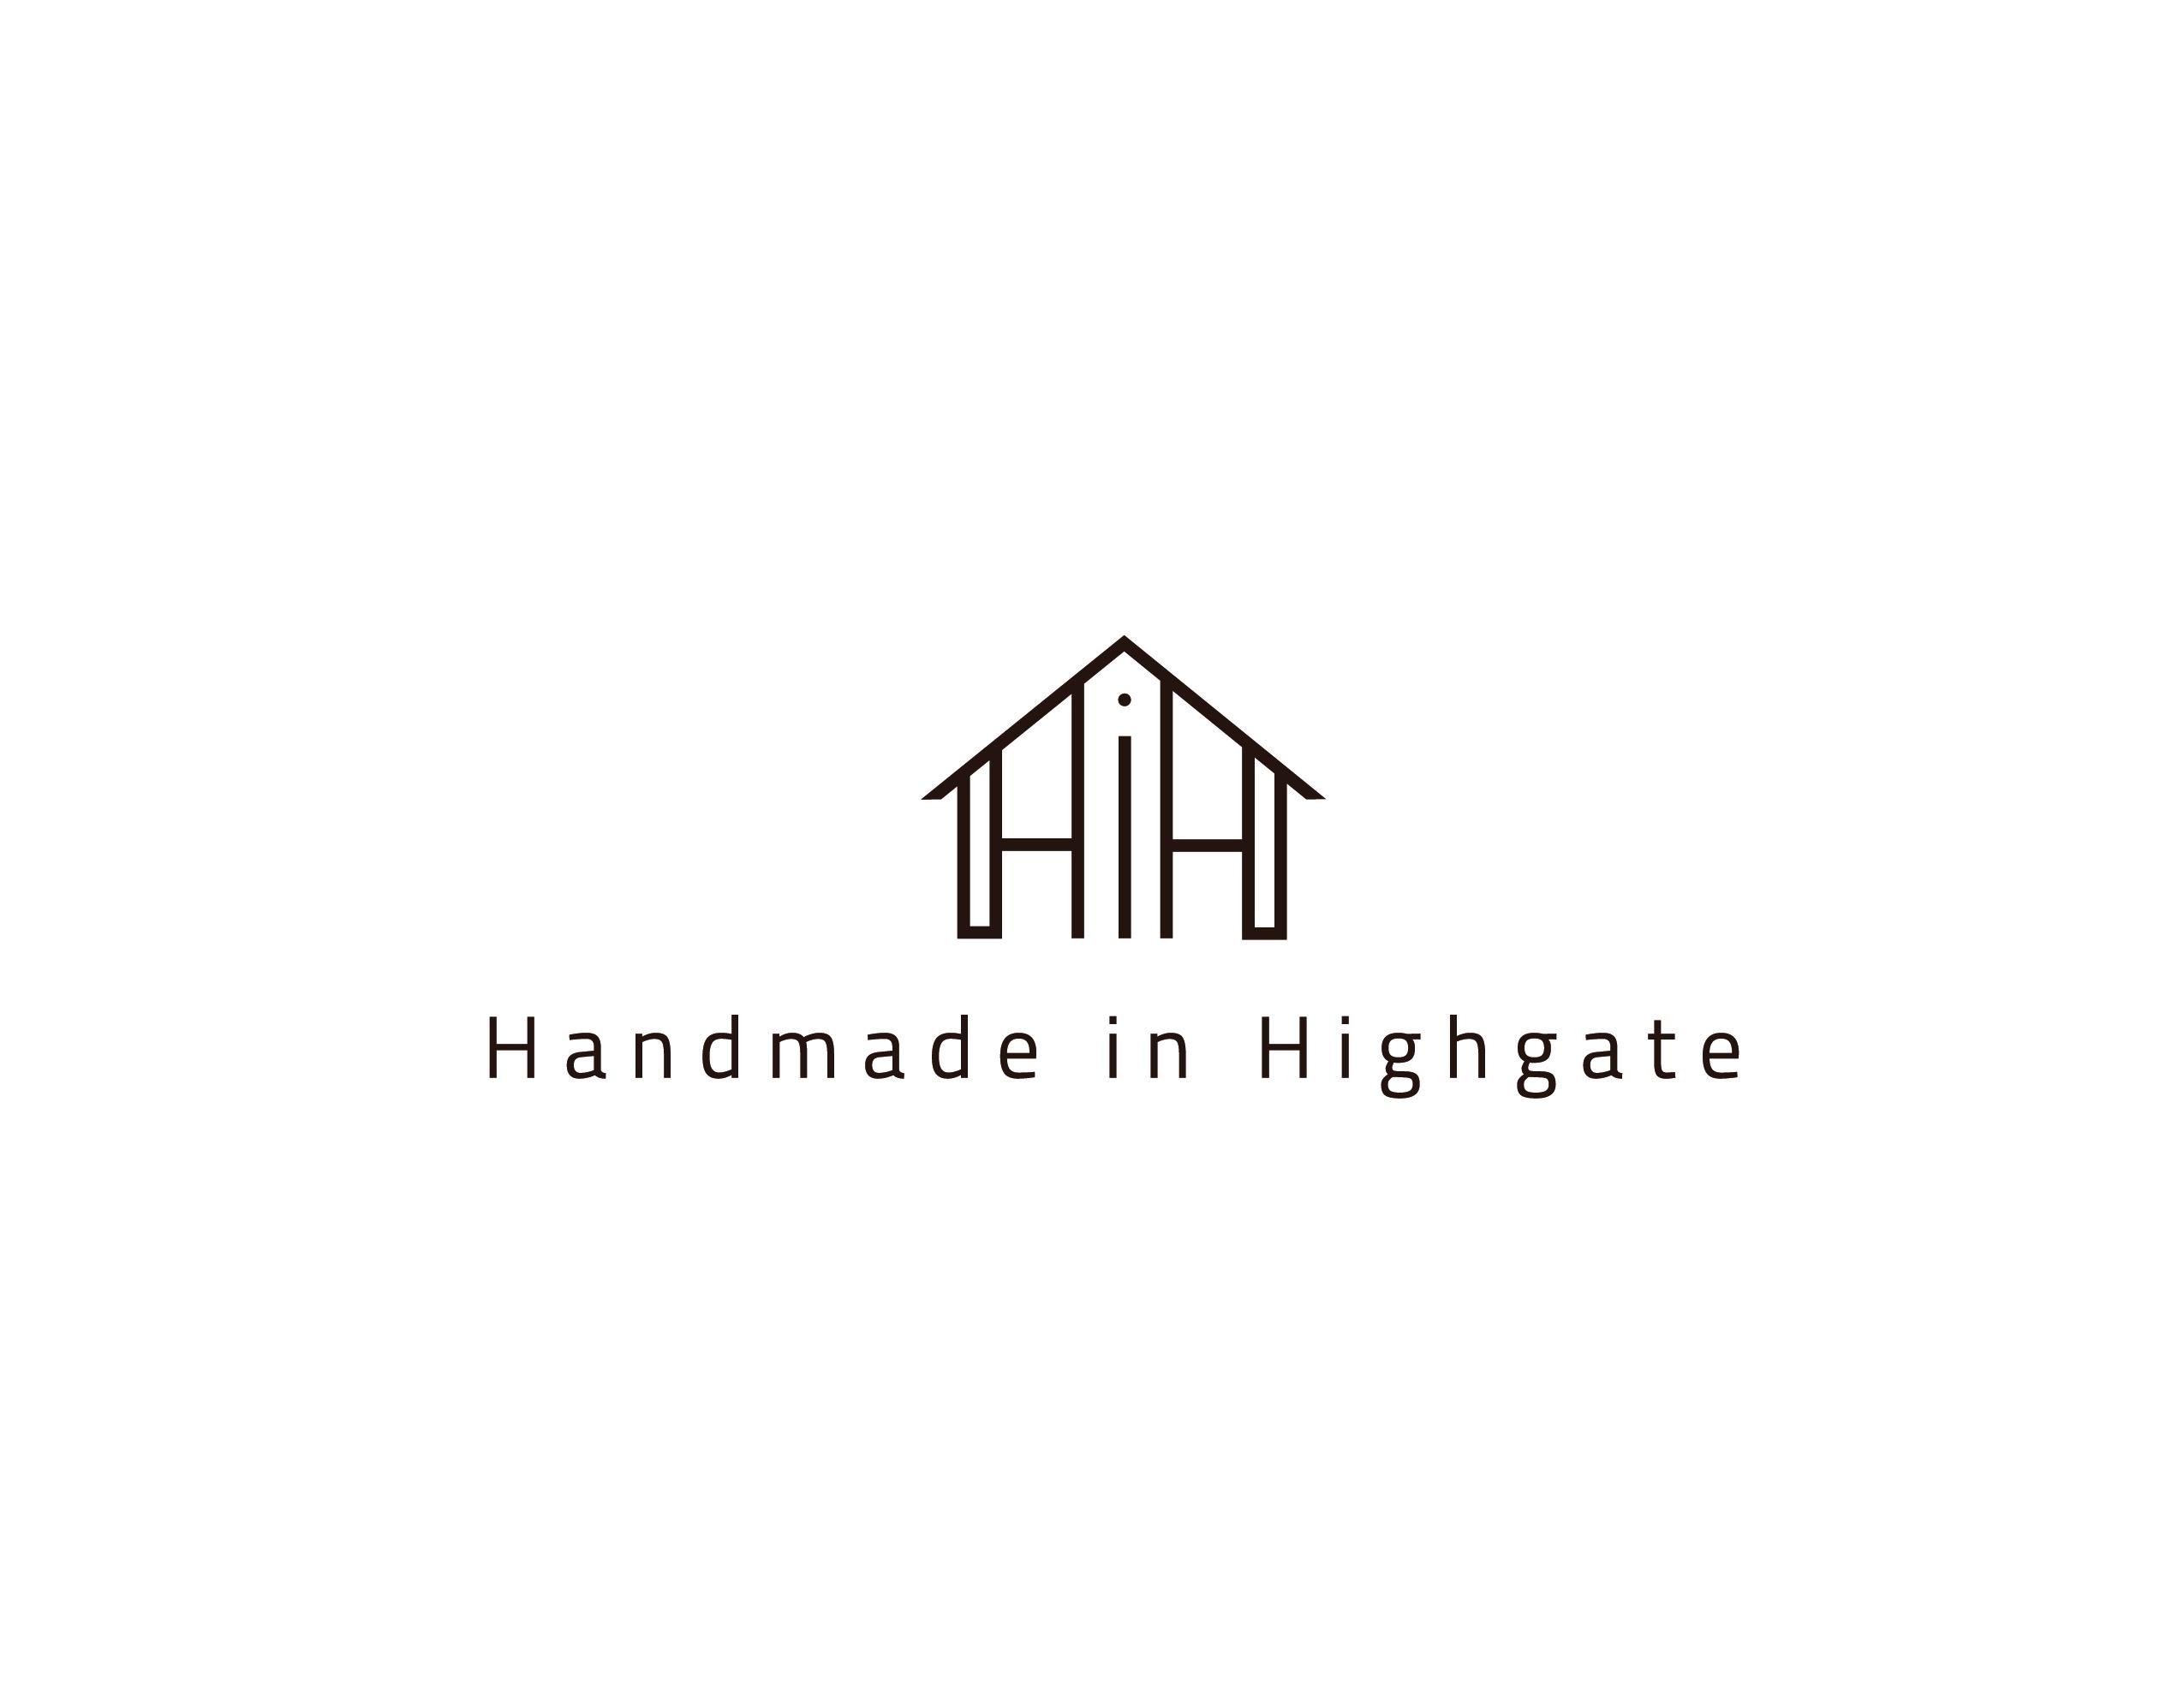 Handmade in Highgate.jpg